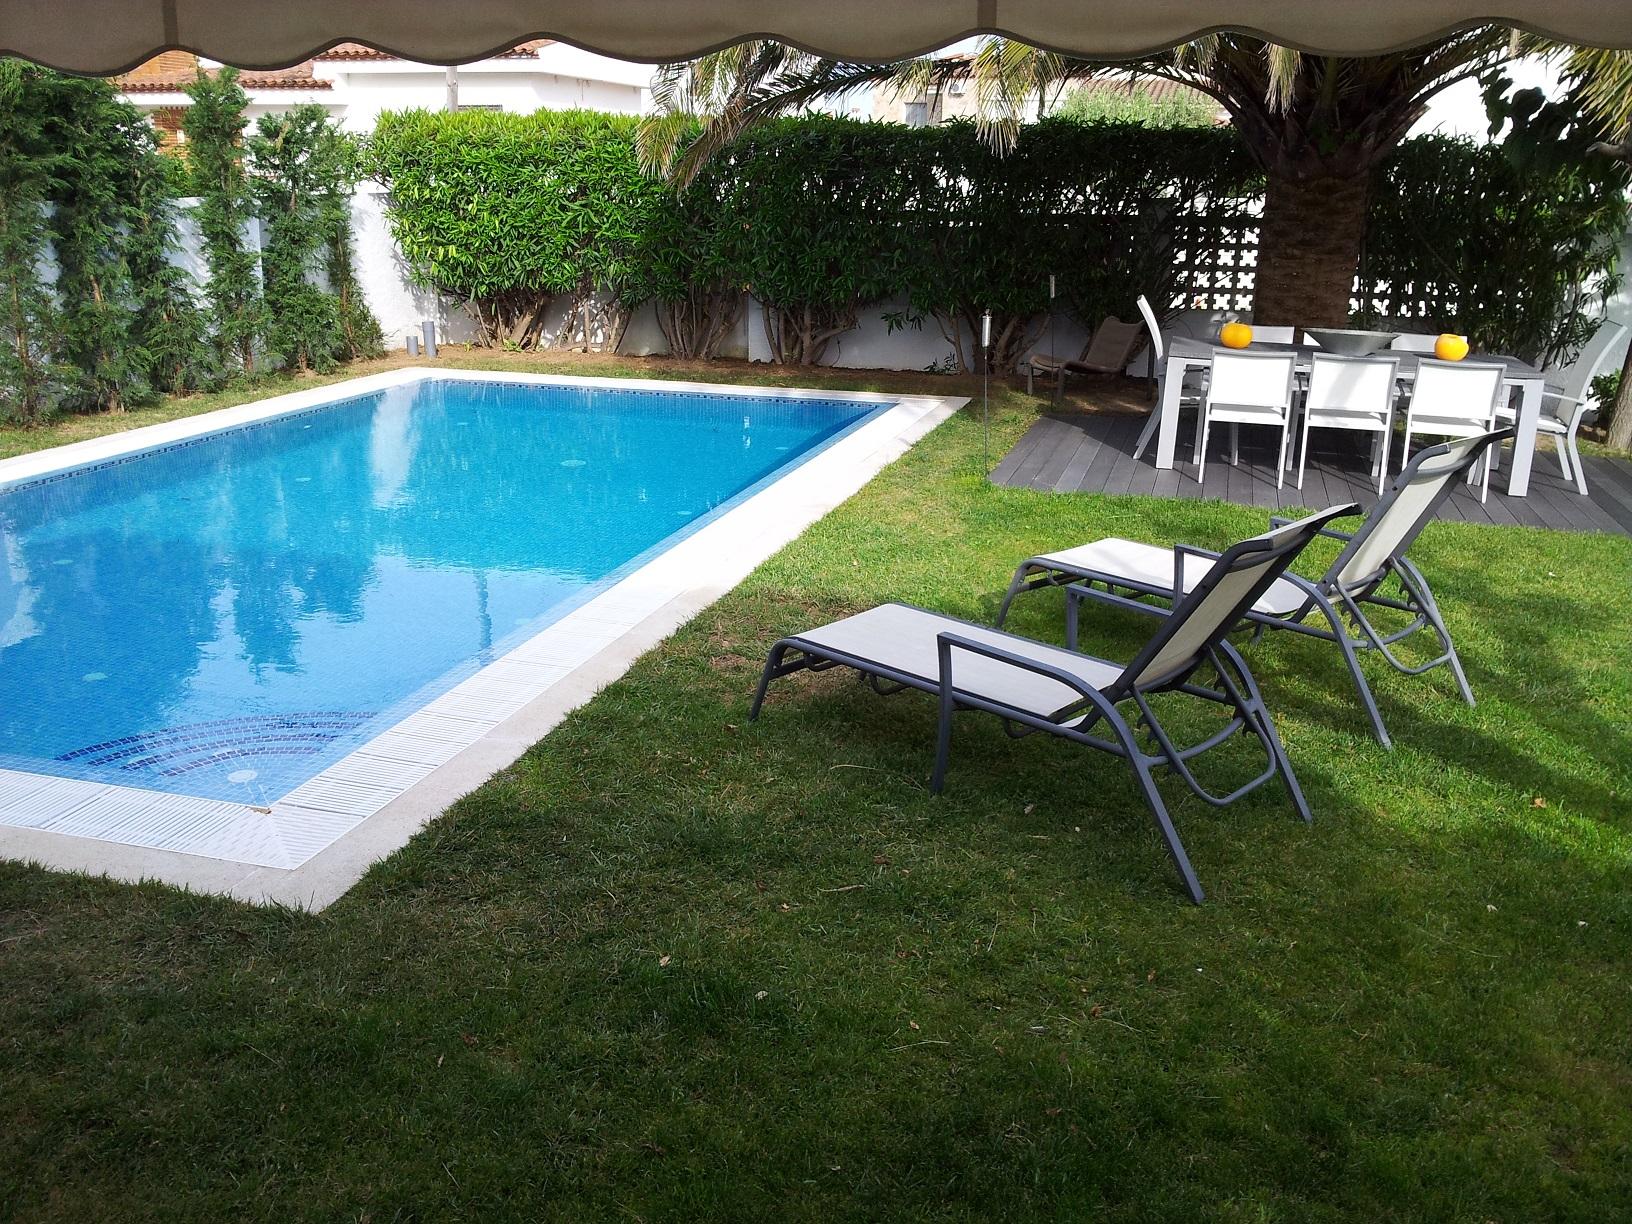 Location Villa De Luxe Avec Piscine à Empuriabrava